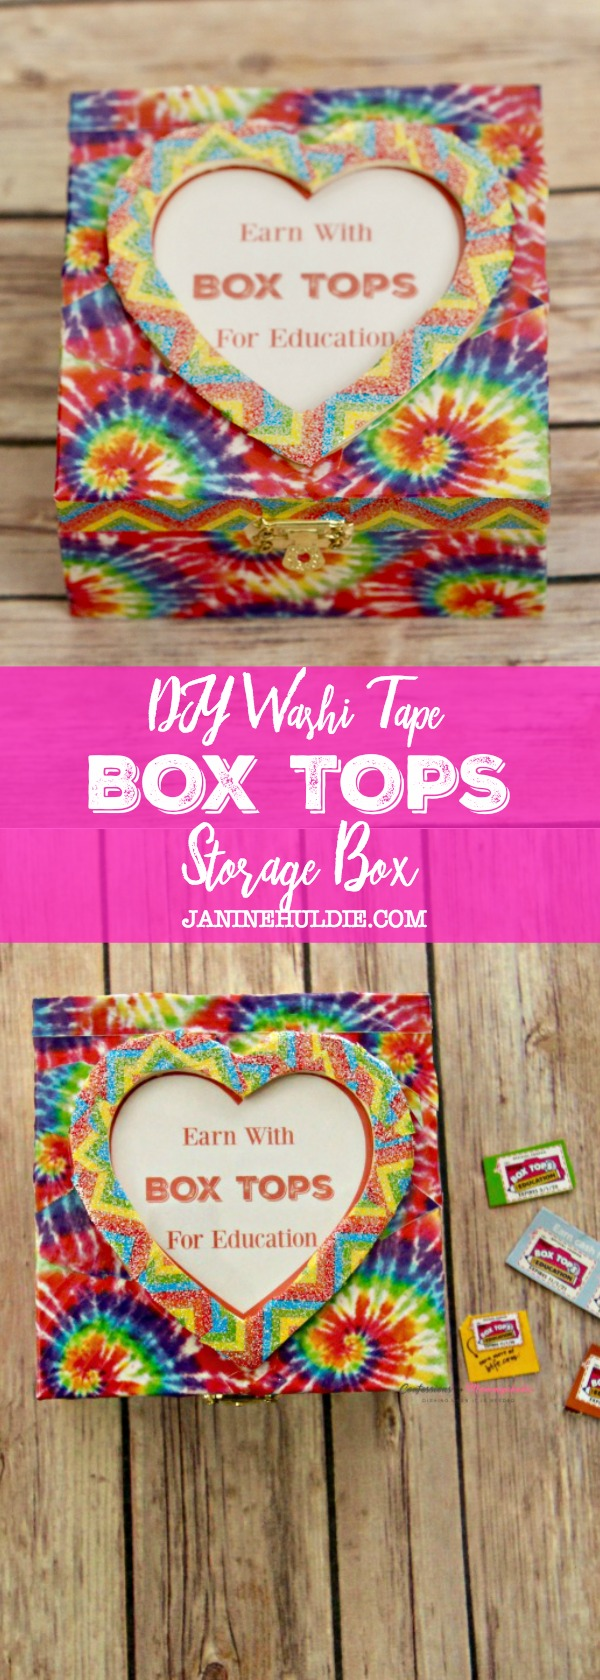 DIY Washi Tape Box Tops Storage Box